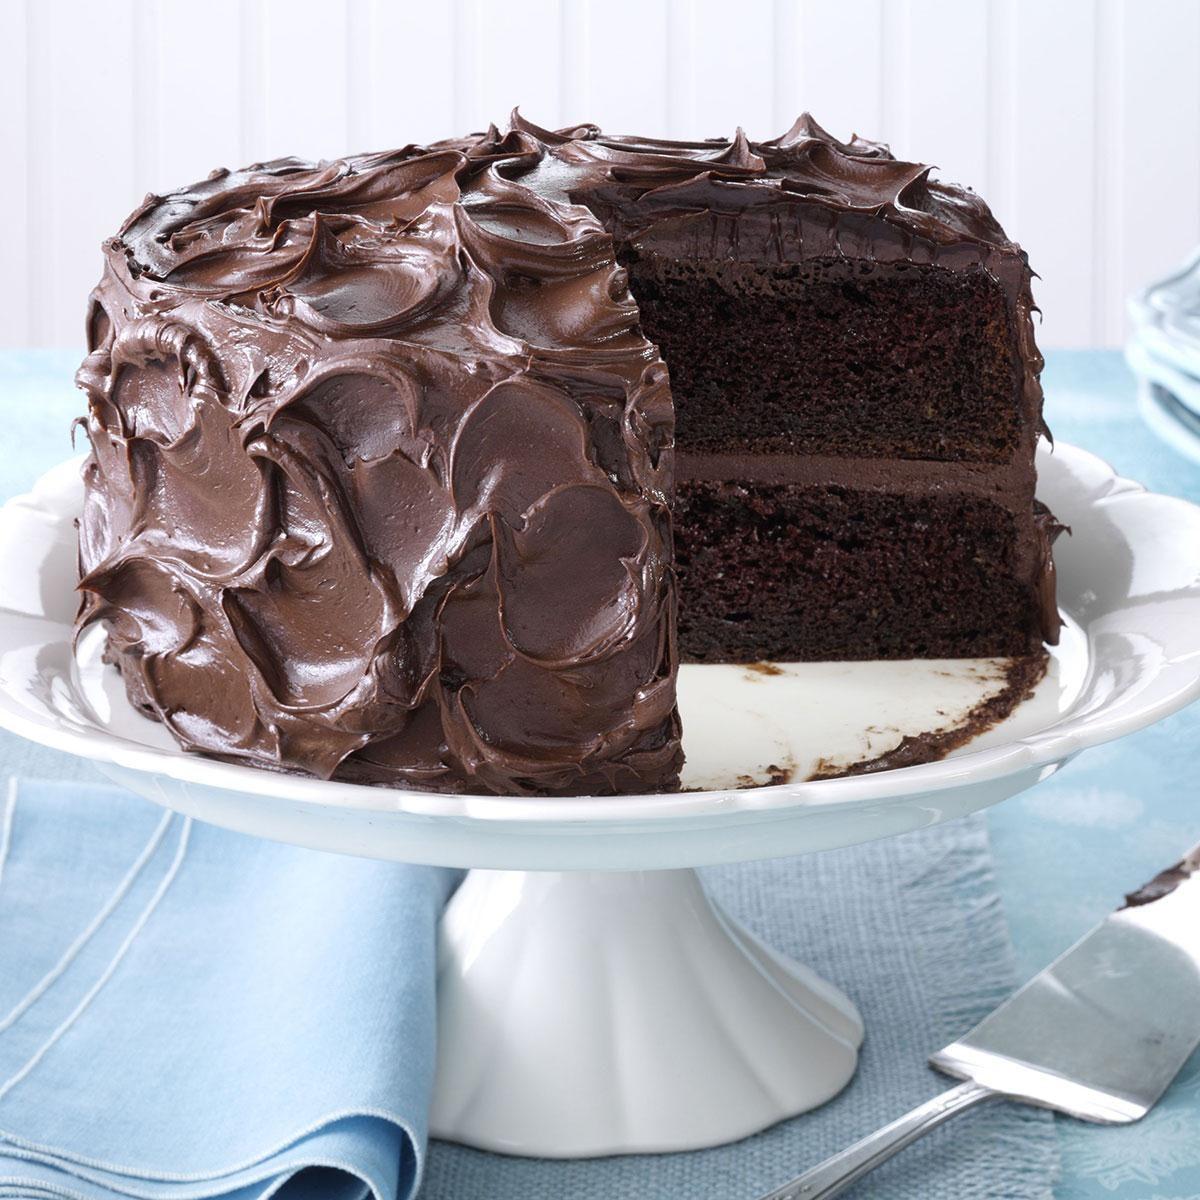 Come-Home-to-Mama Chocolate Cake Recipe | Taste of Home